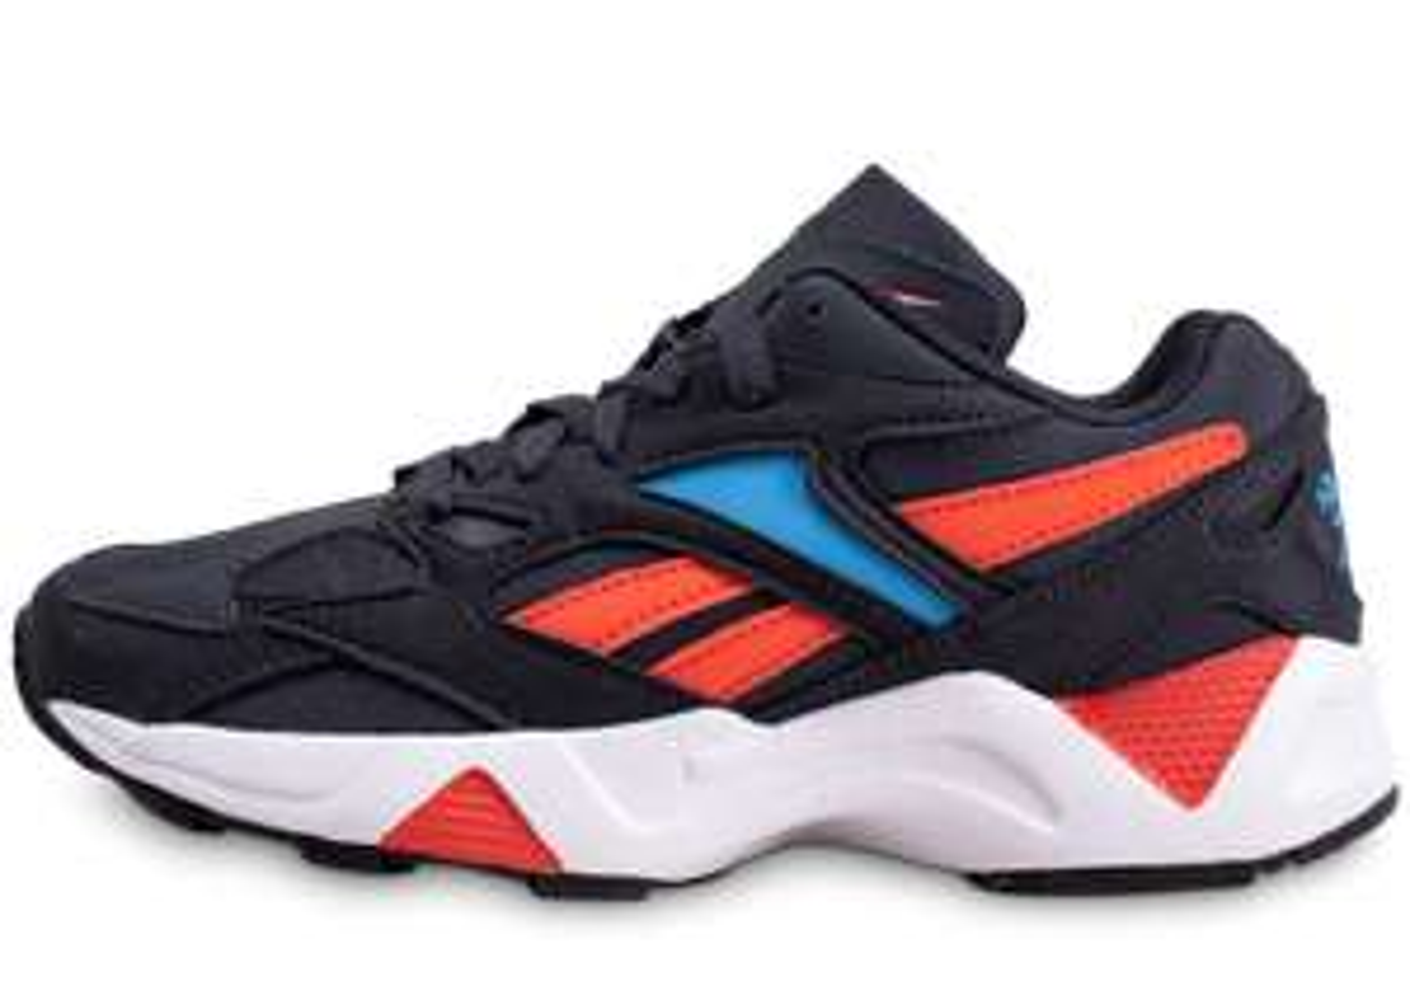 Chaussures Reebok Aztrek 96 - bleu/orange (du 36 au 40)